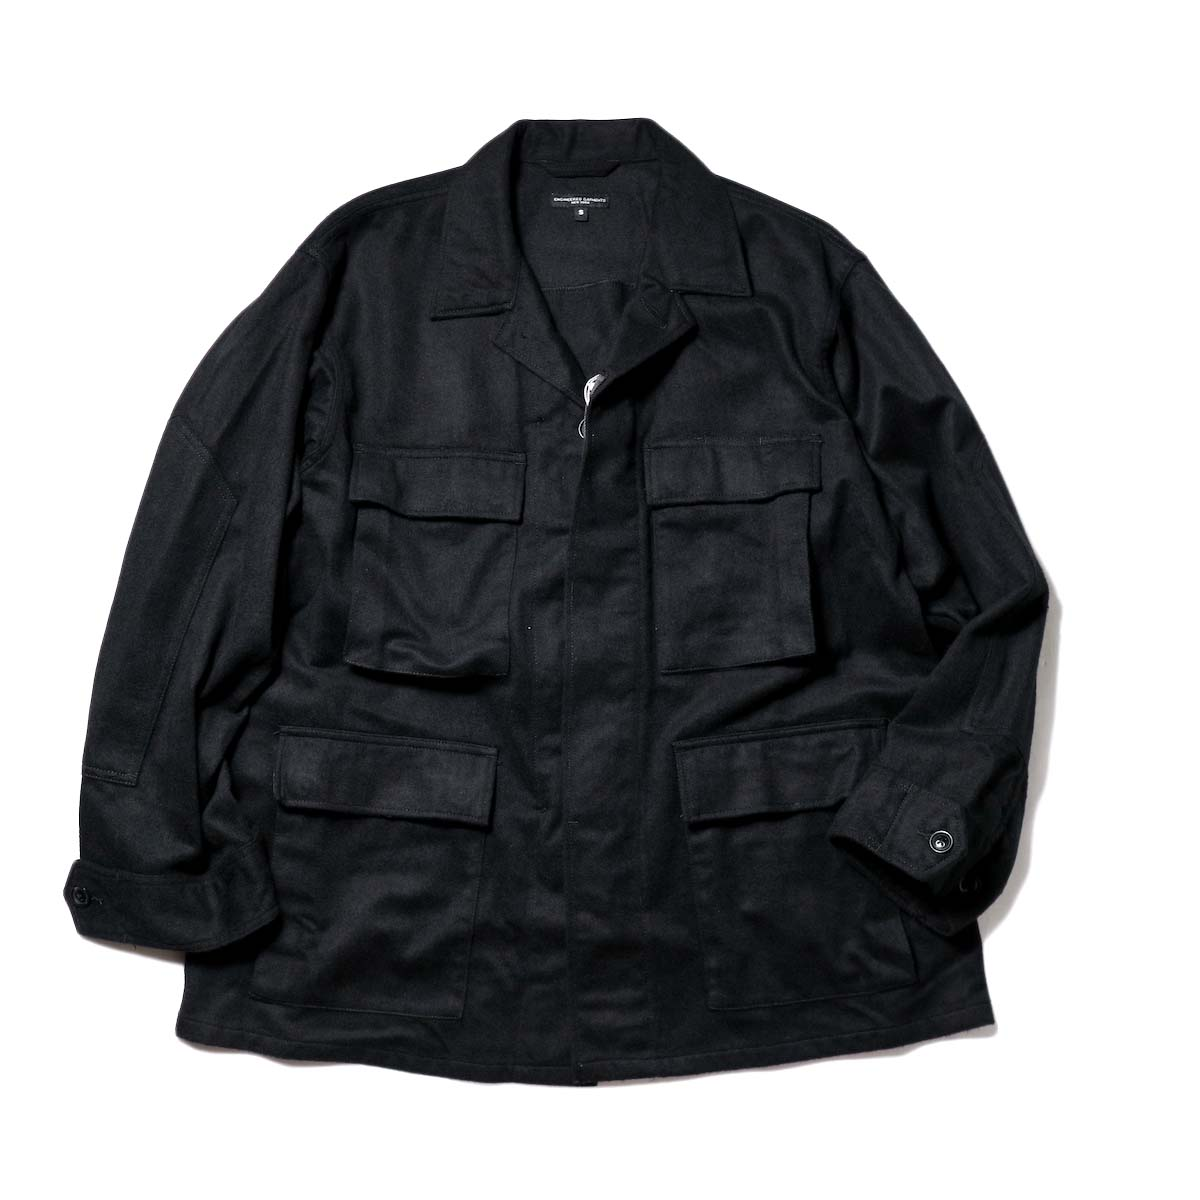 Engineered Garments / BDU Jacket w/c flannel (Black)